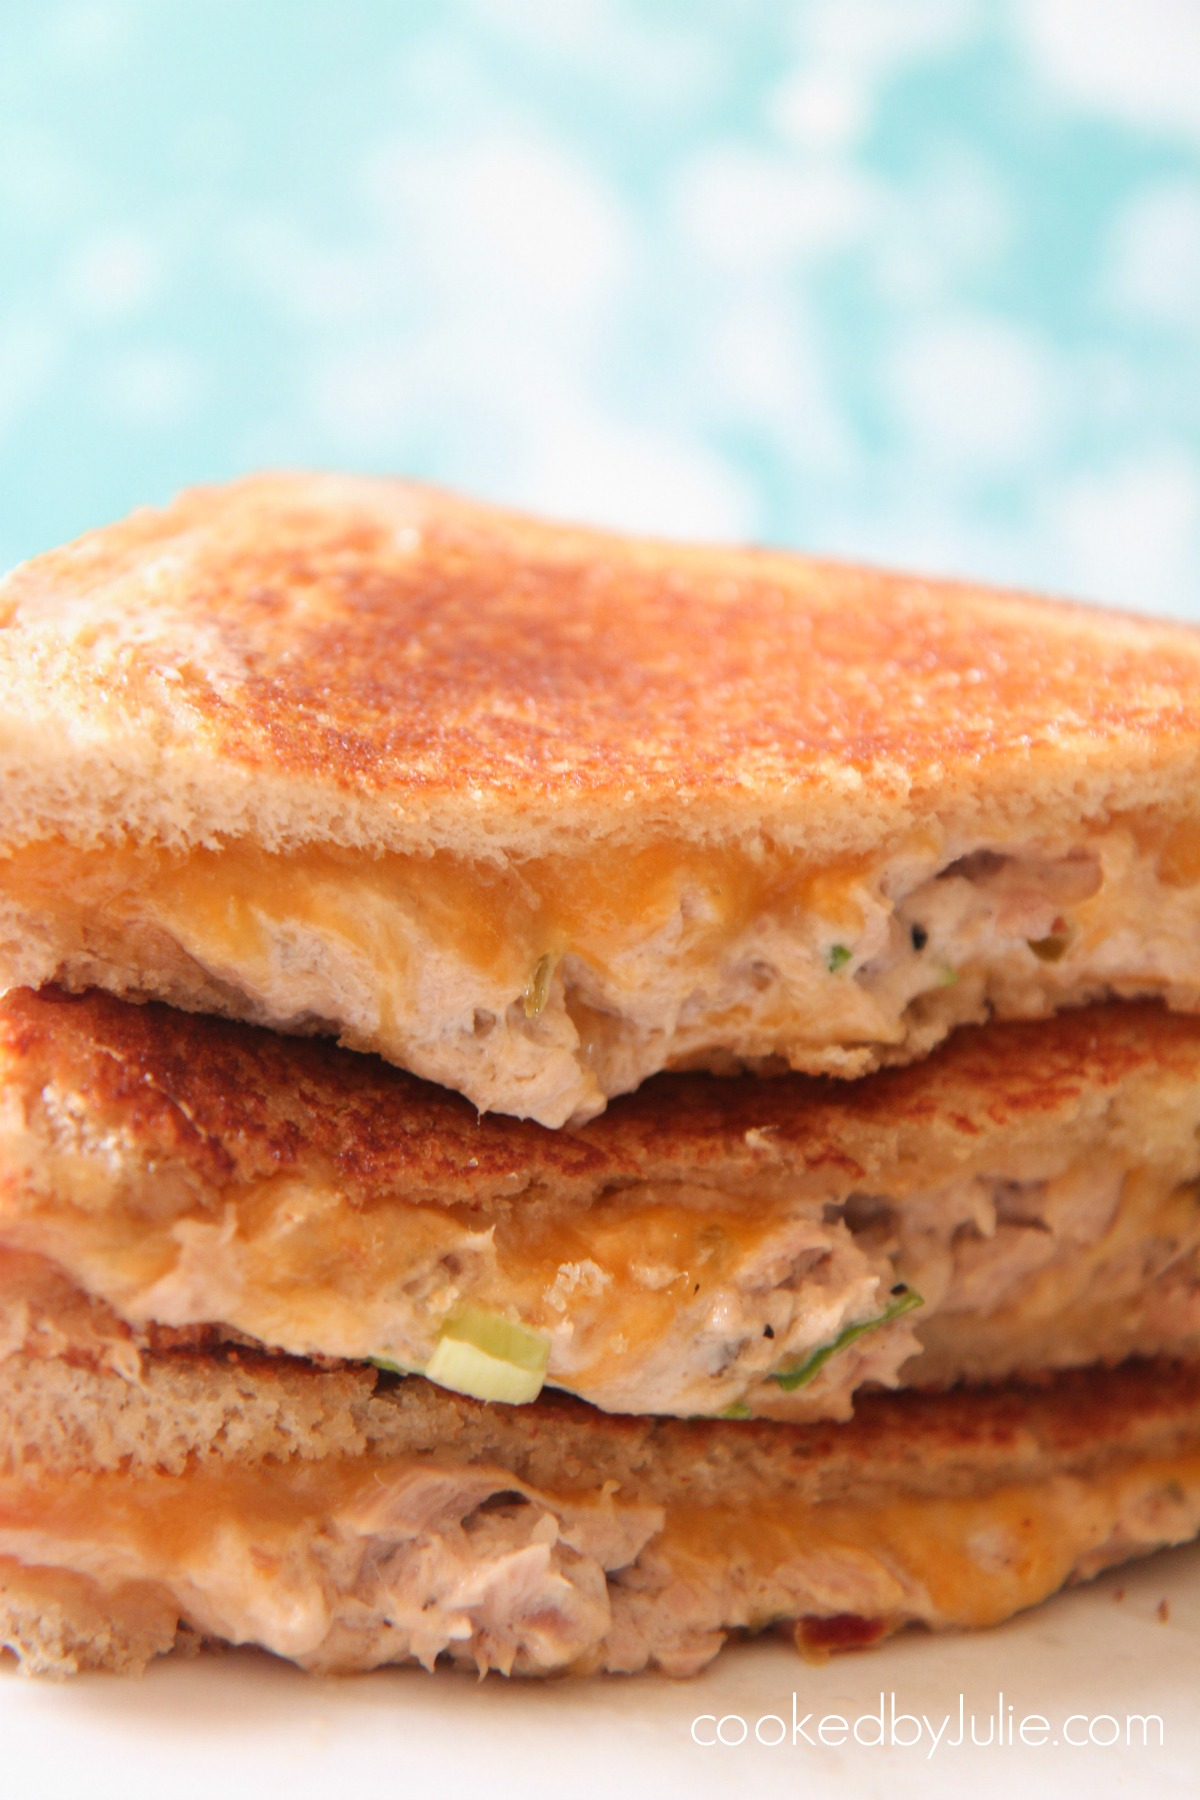 Three tuna melt sandwiches up close with a blue backdrop.